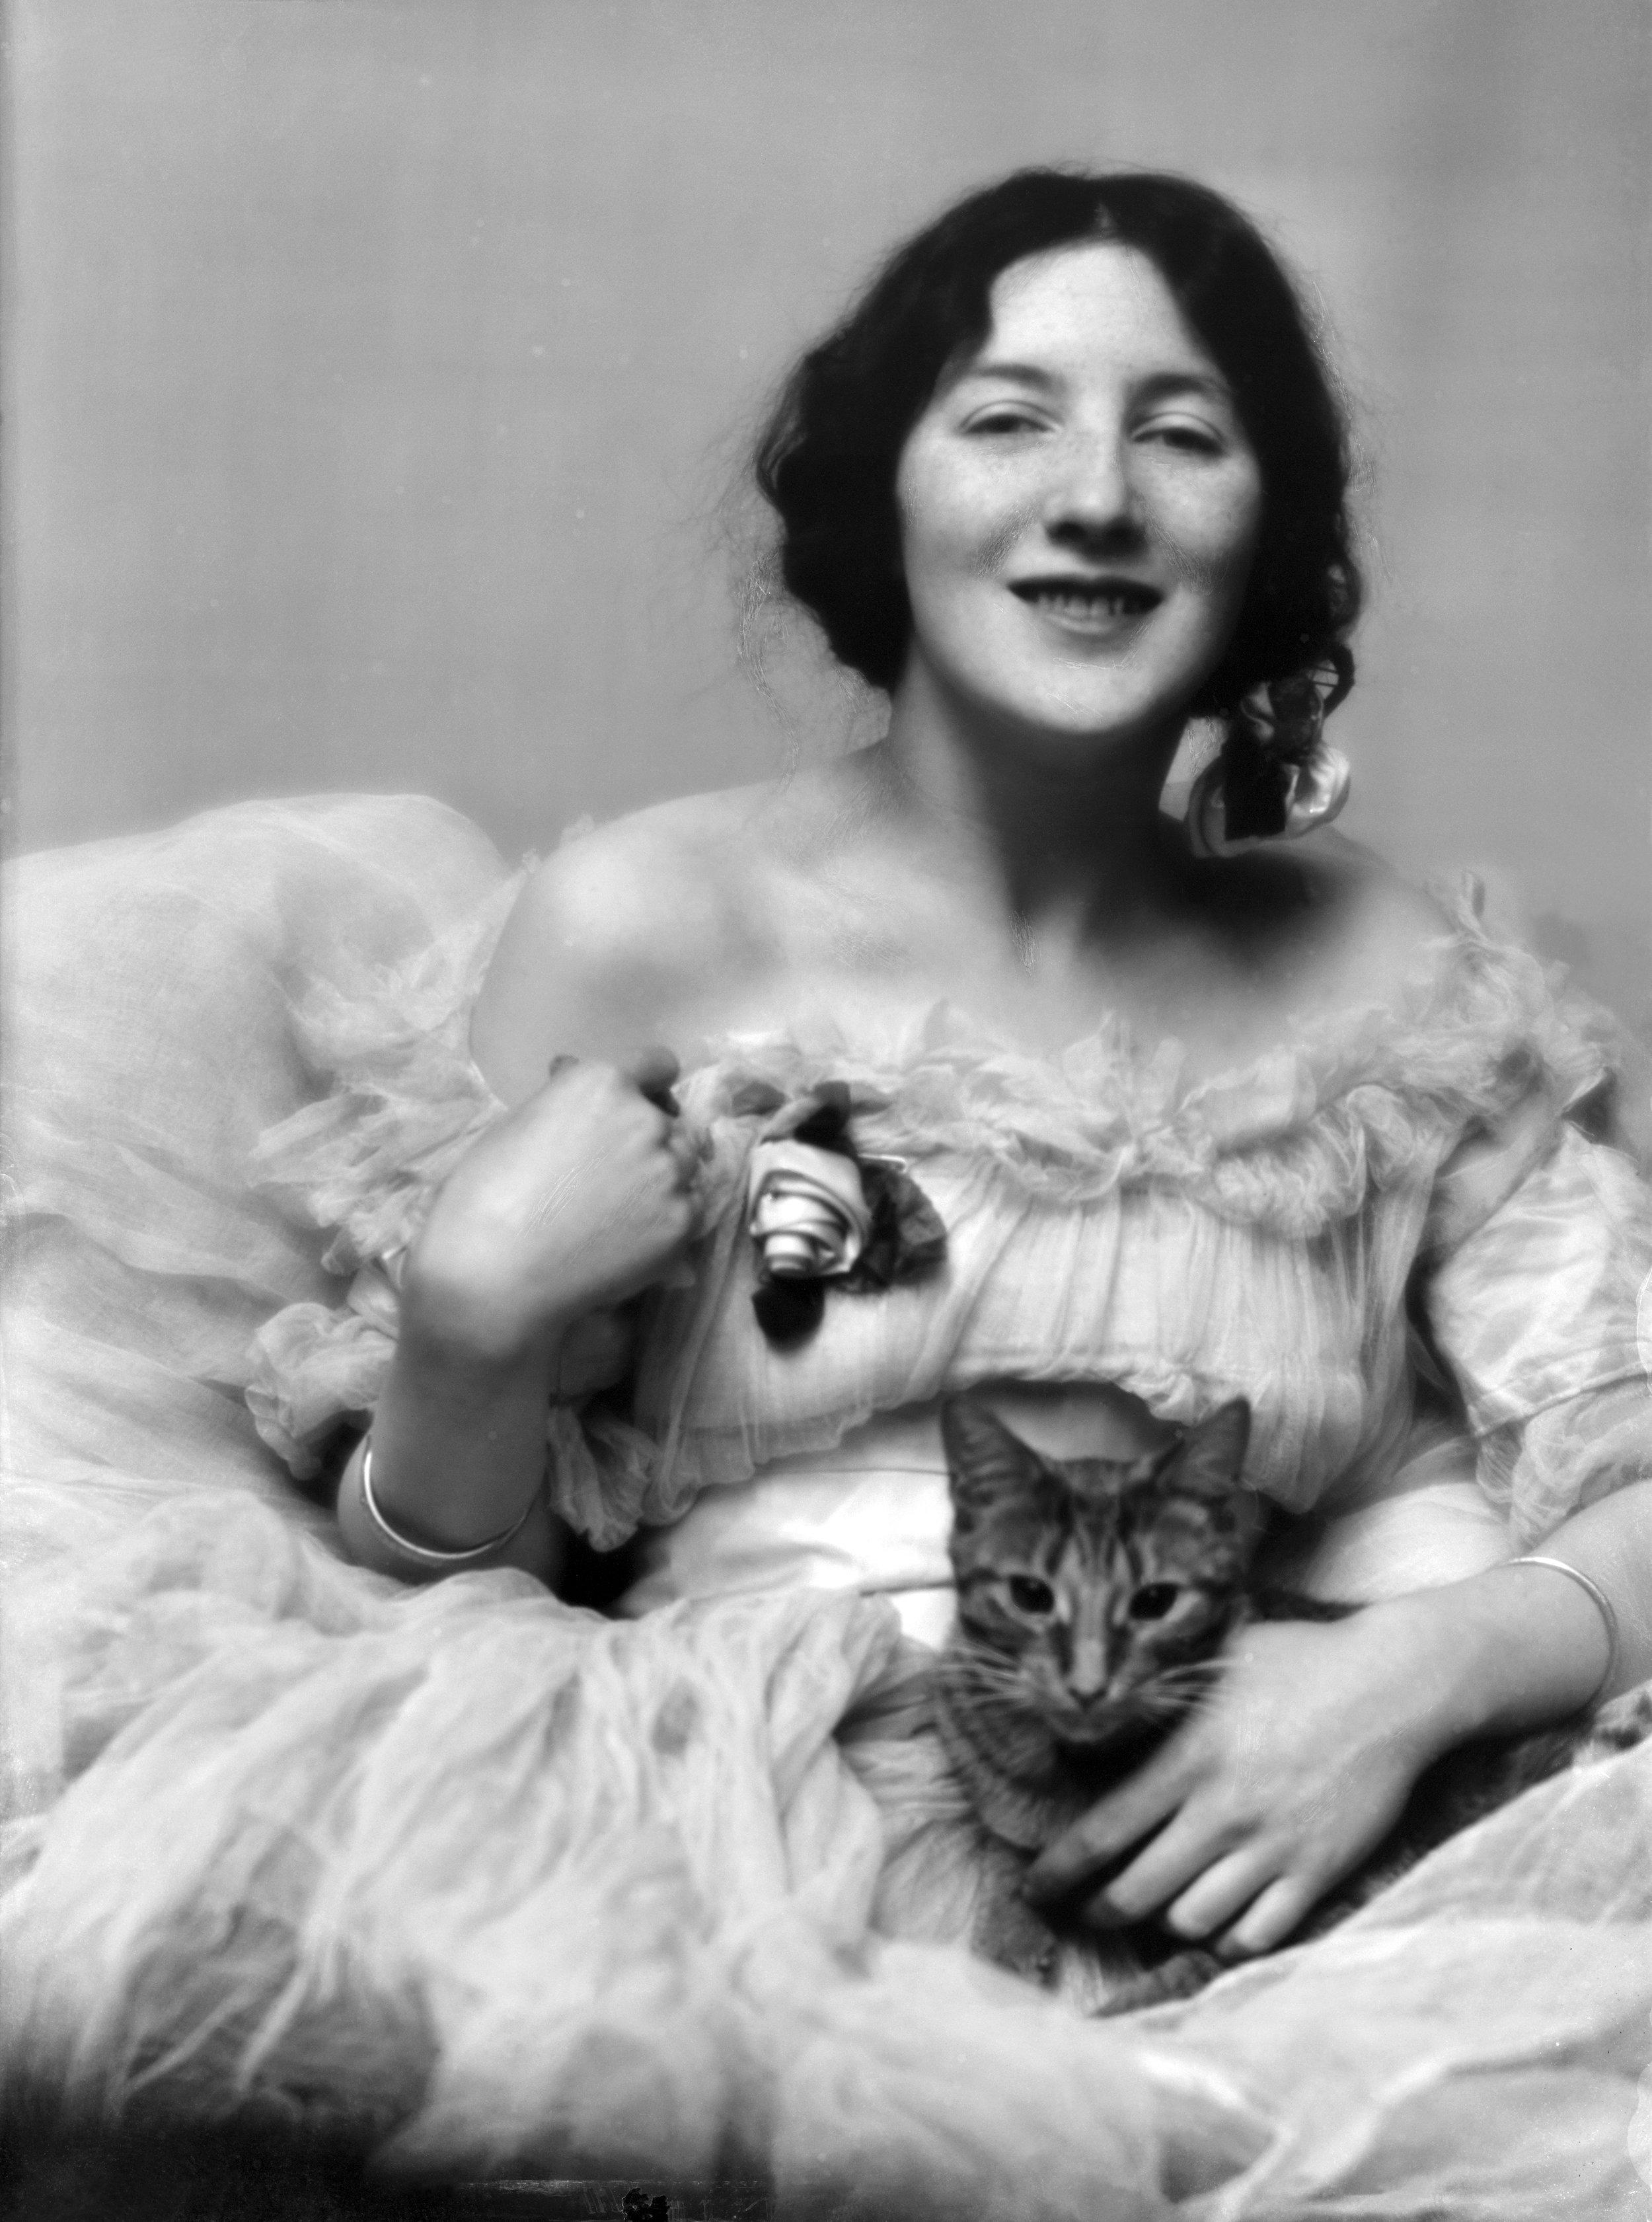 Audrey Munson with a cat (1915)